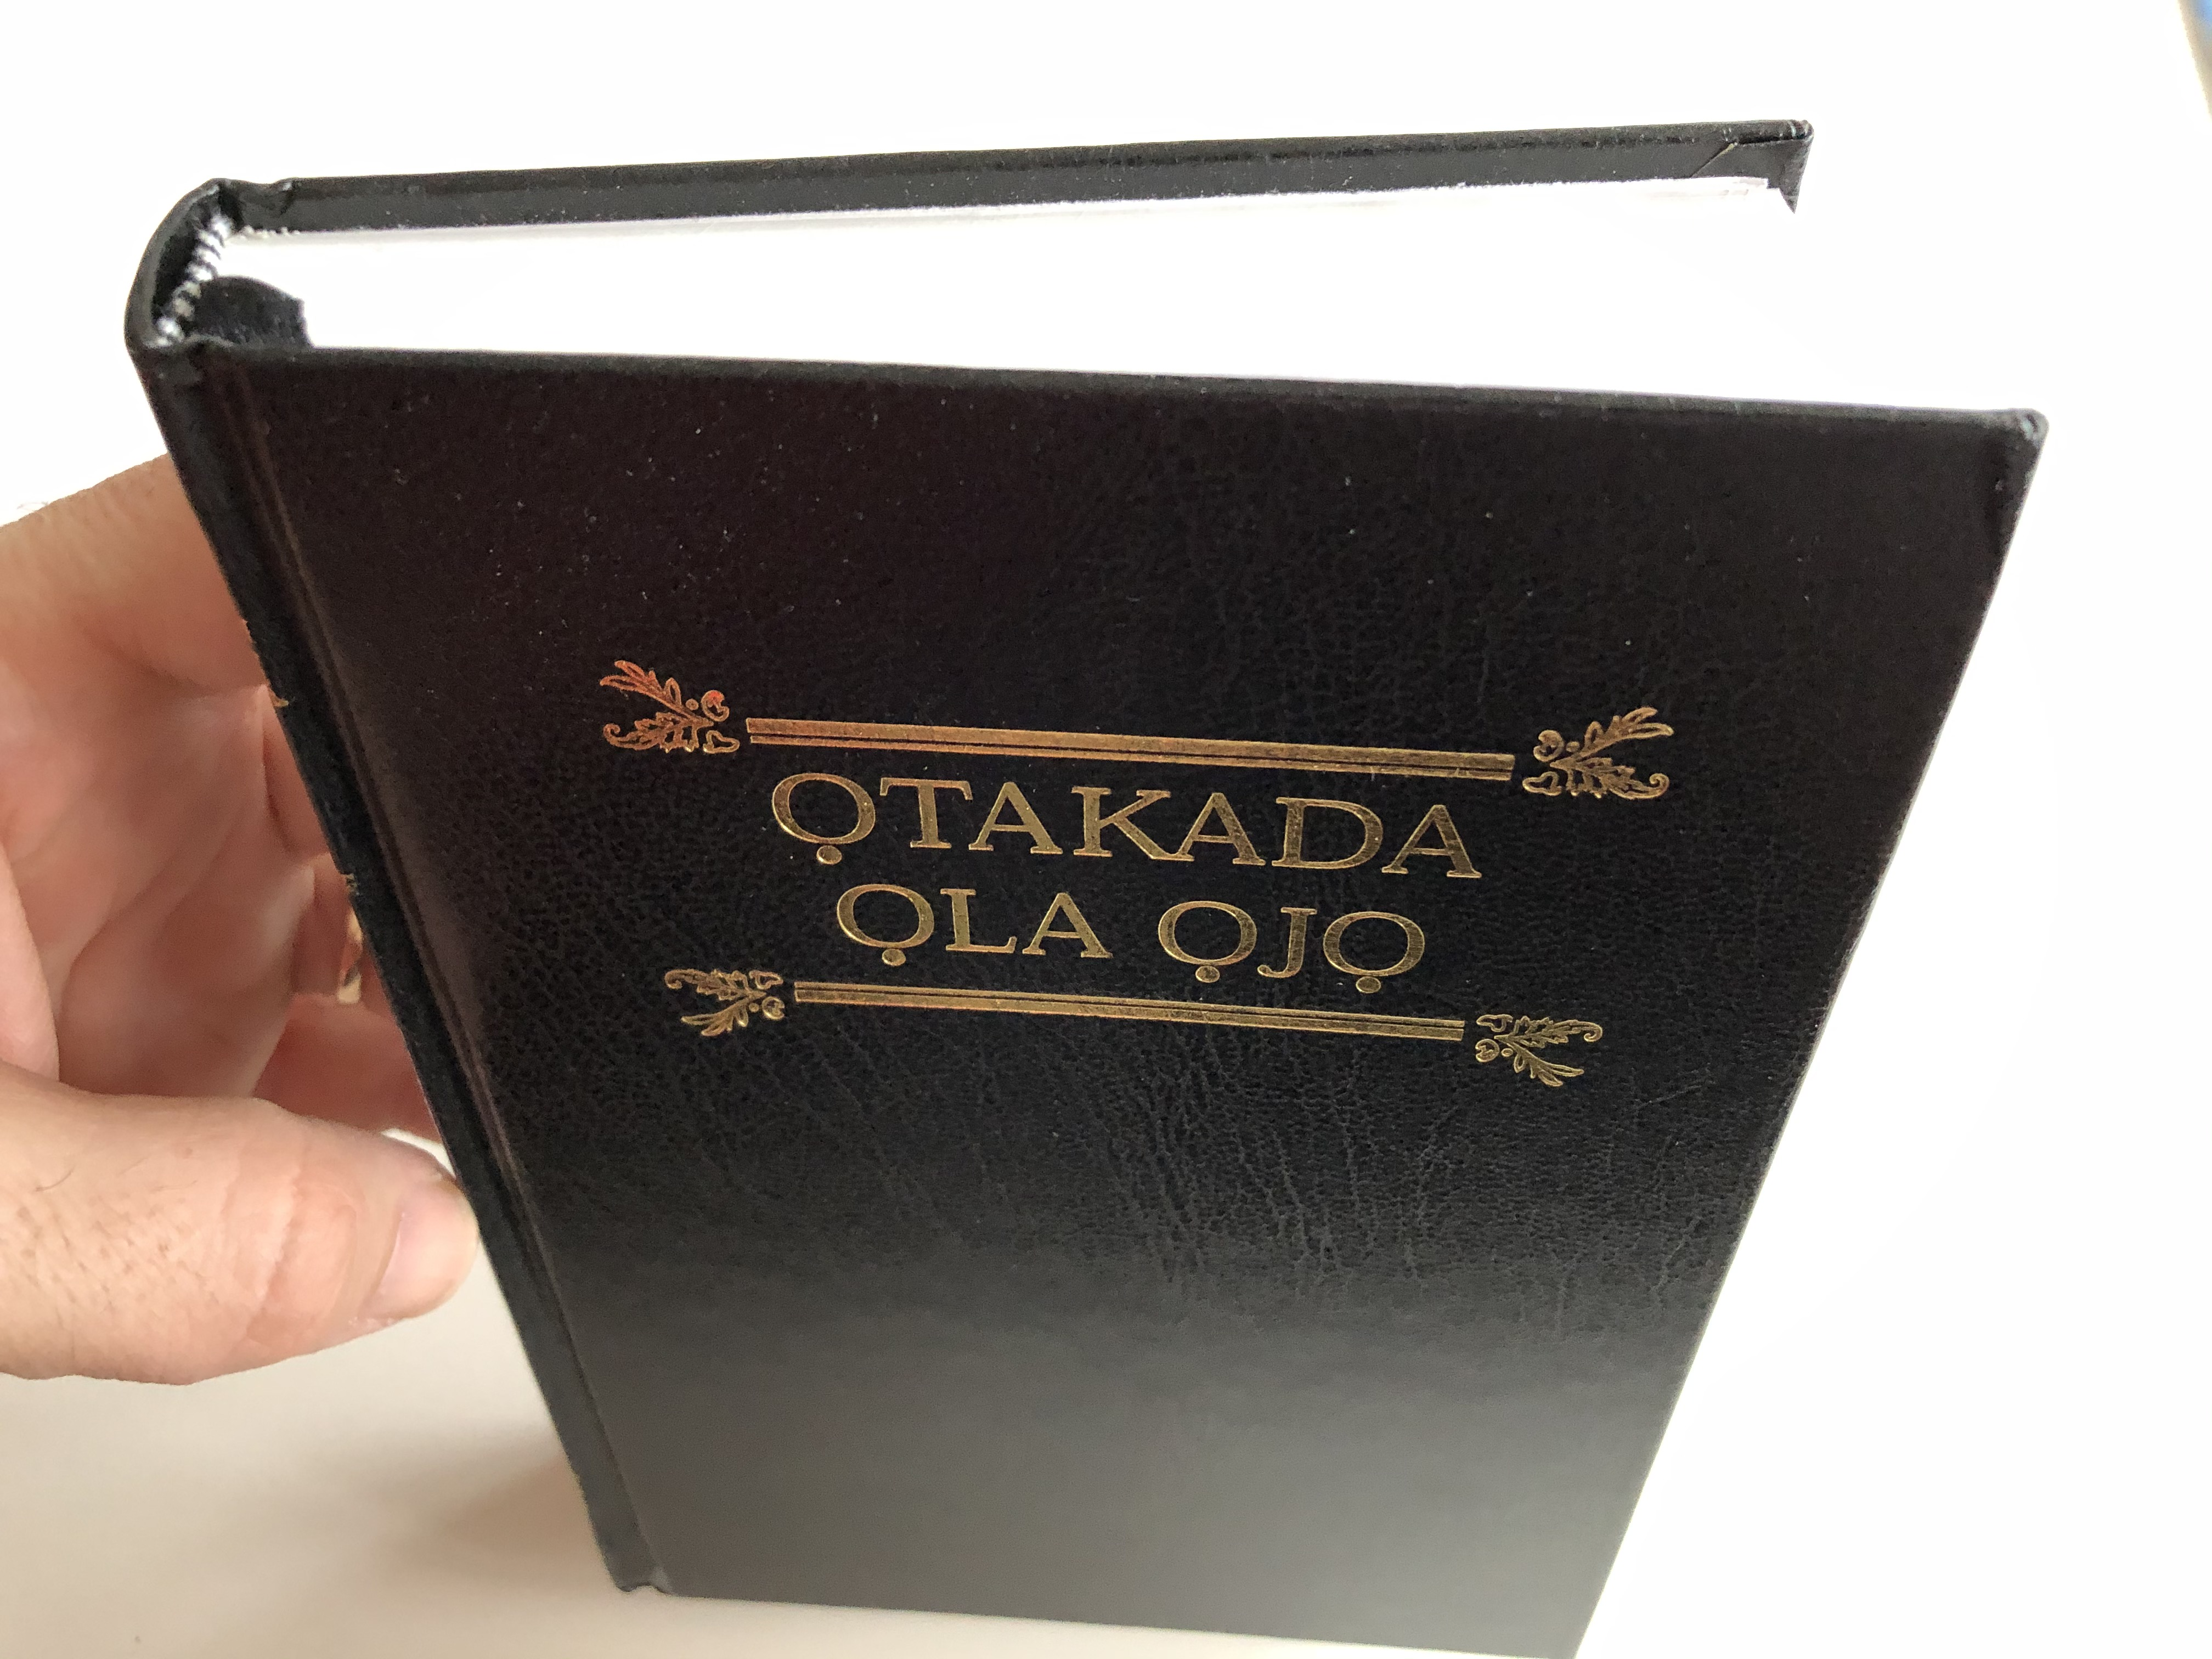 otakada-ola-ojo-holy-bible-in-igala-bible-society-of-nigeria-1970-16.jpg